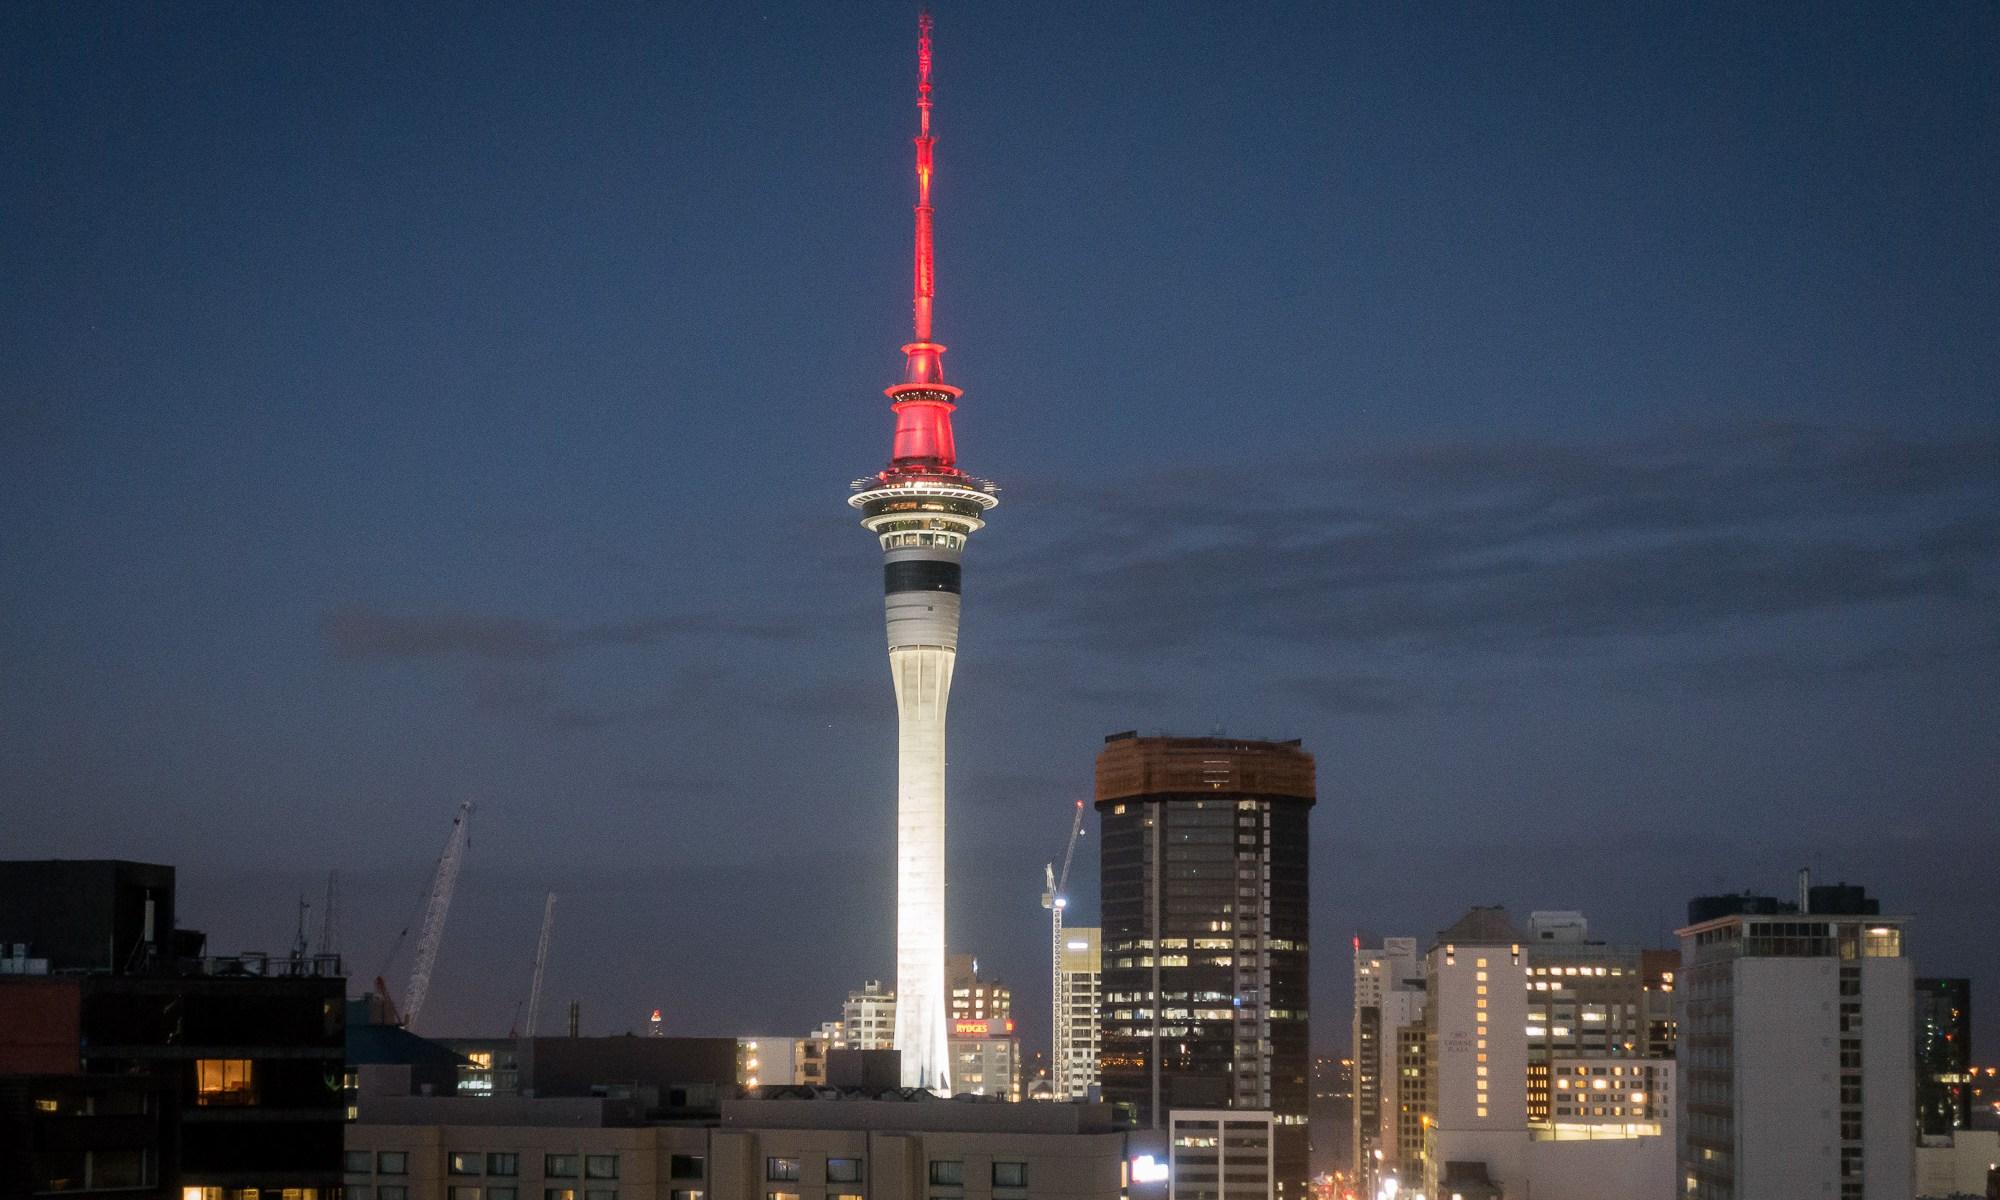 Auckland Skytower at night